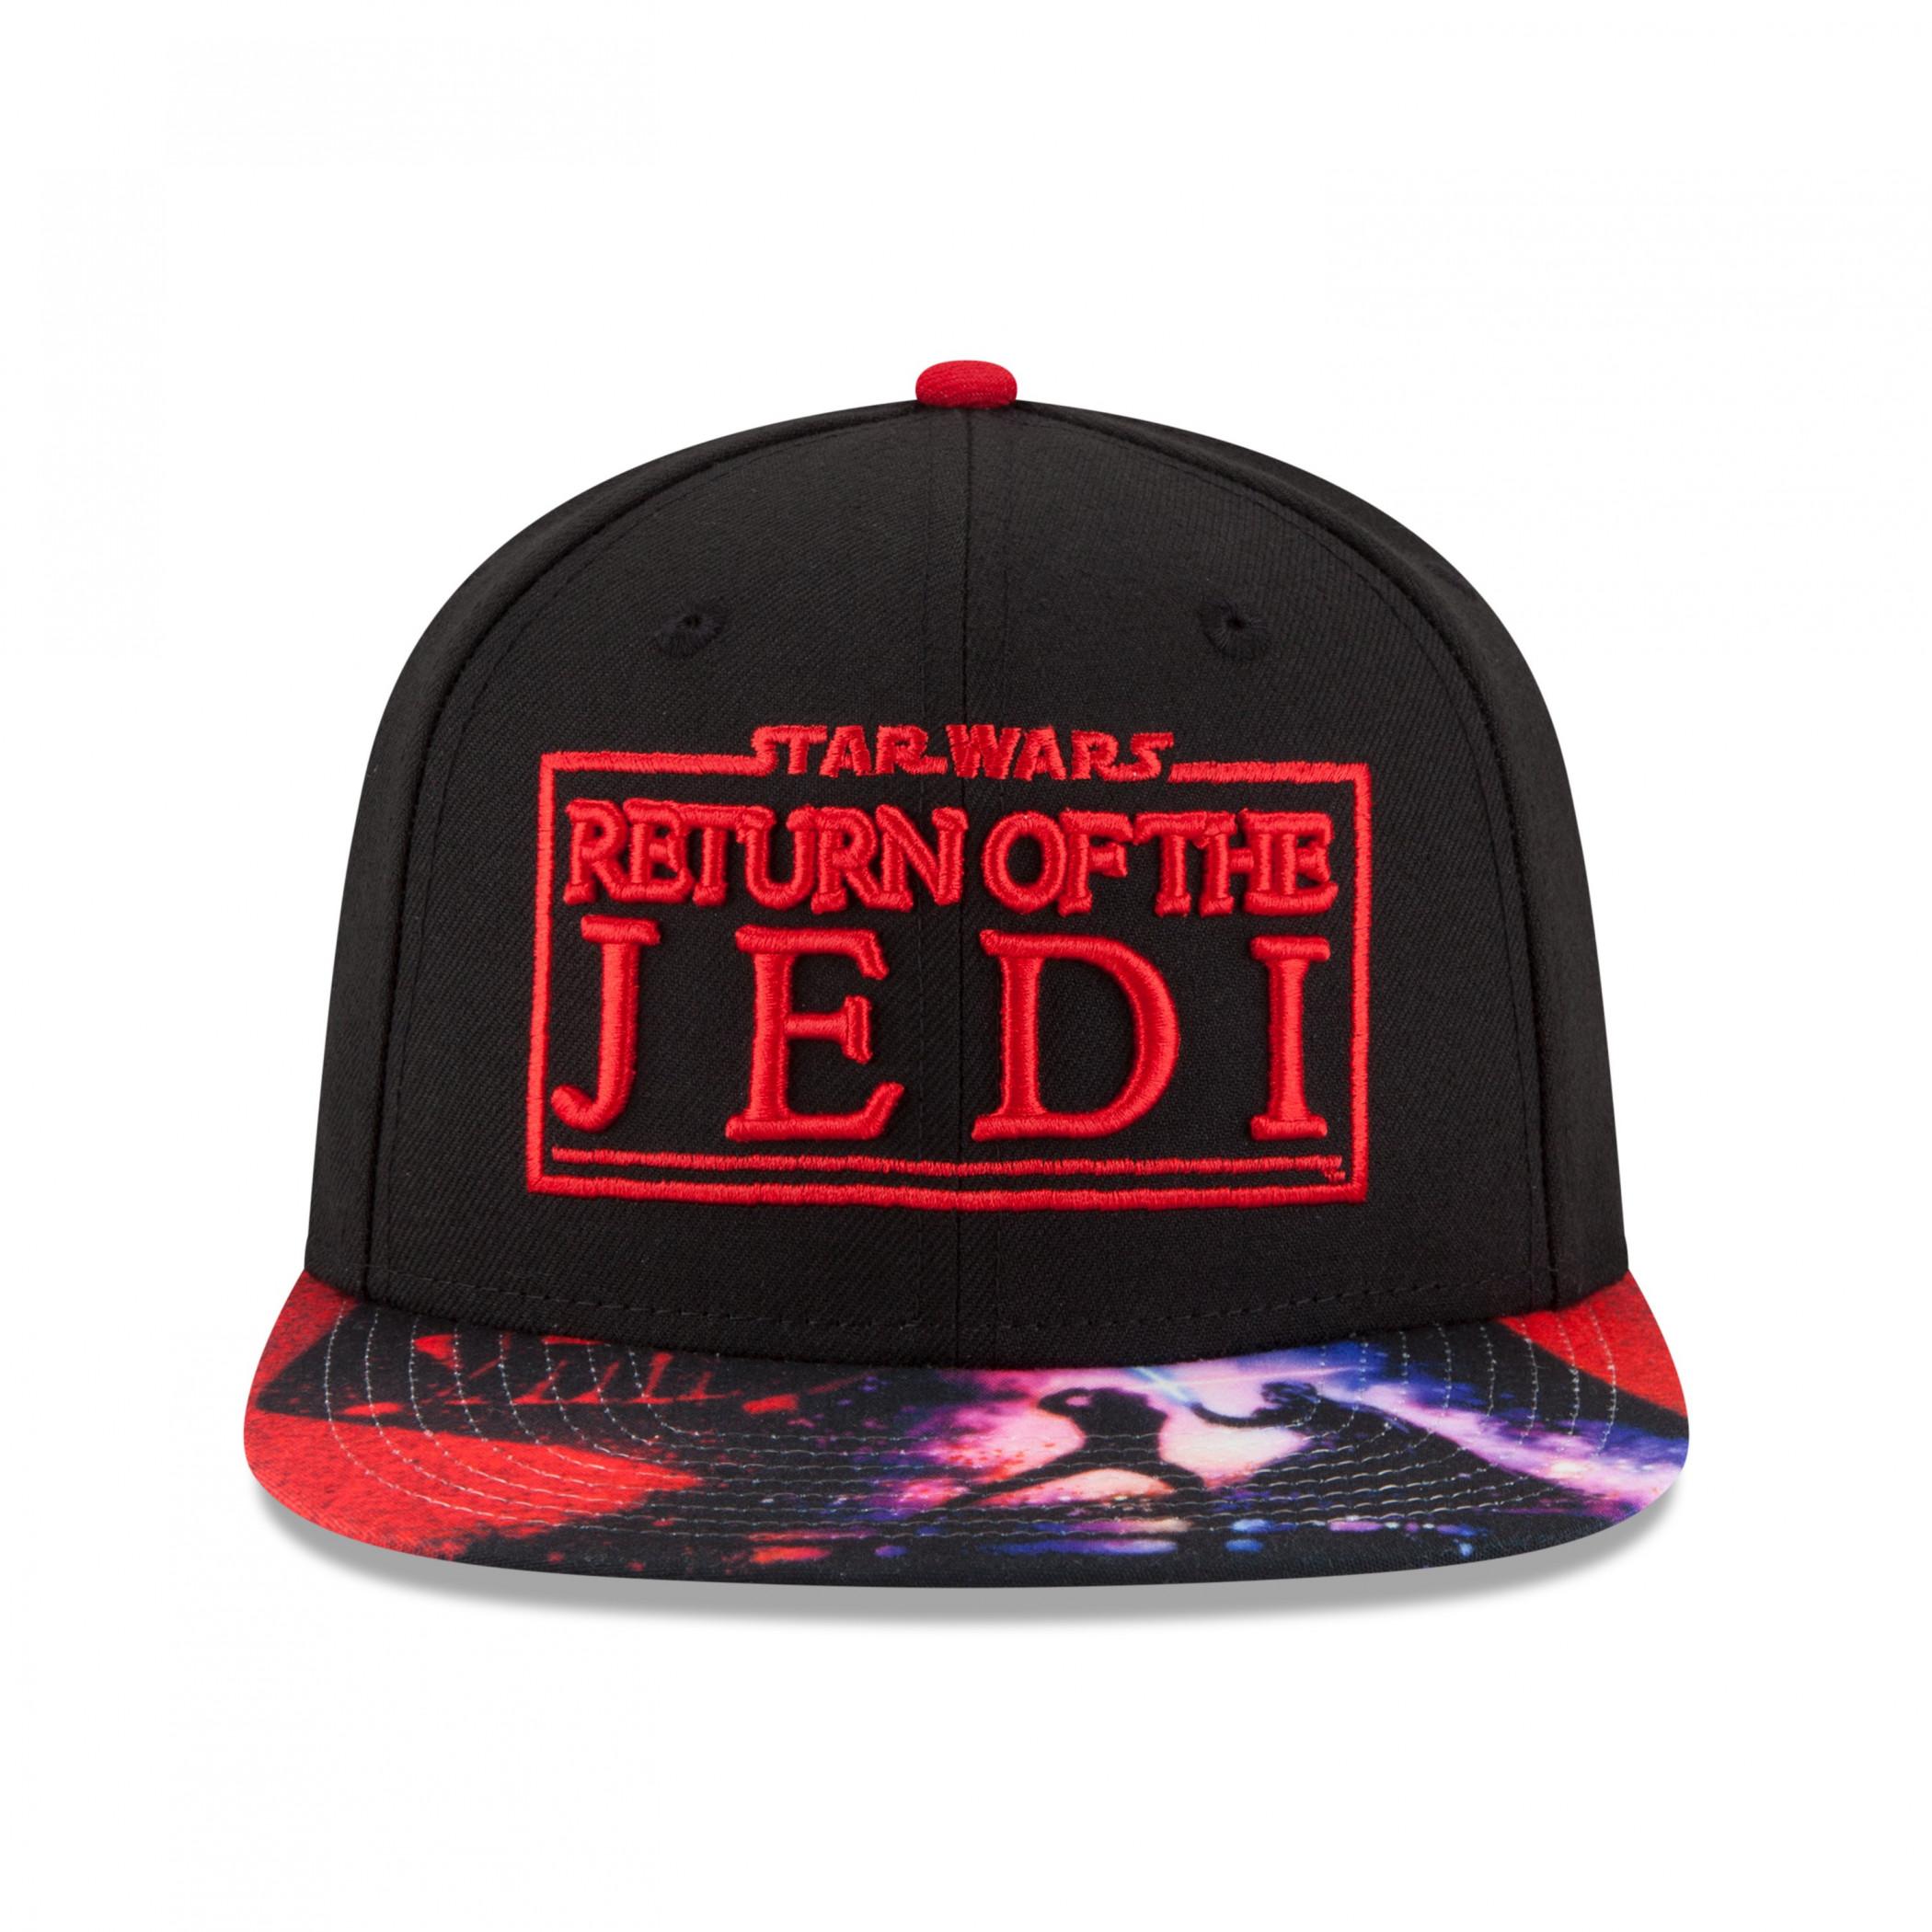 Star Wars Return of the Jedi Scene New Era 9Fifty Adjustable Hat